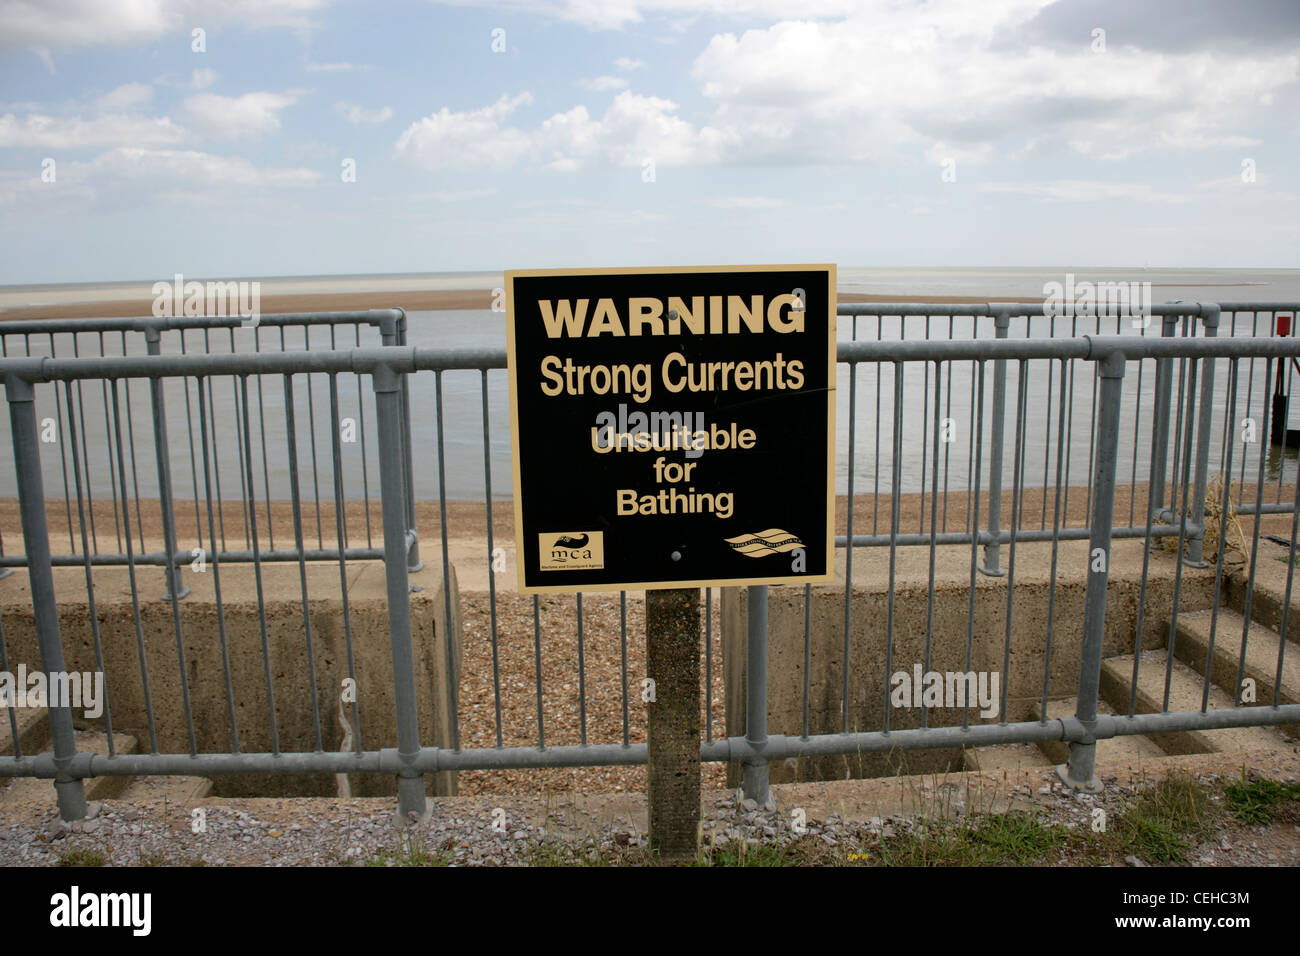 Warning Strong Currents Unsuitable for Bathing, Felixstowe, Suffolk, UK - Stock Image